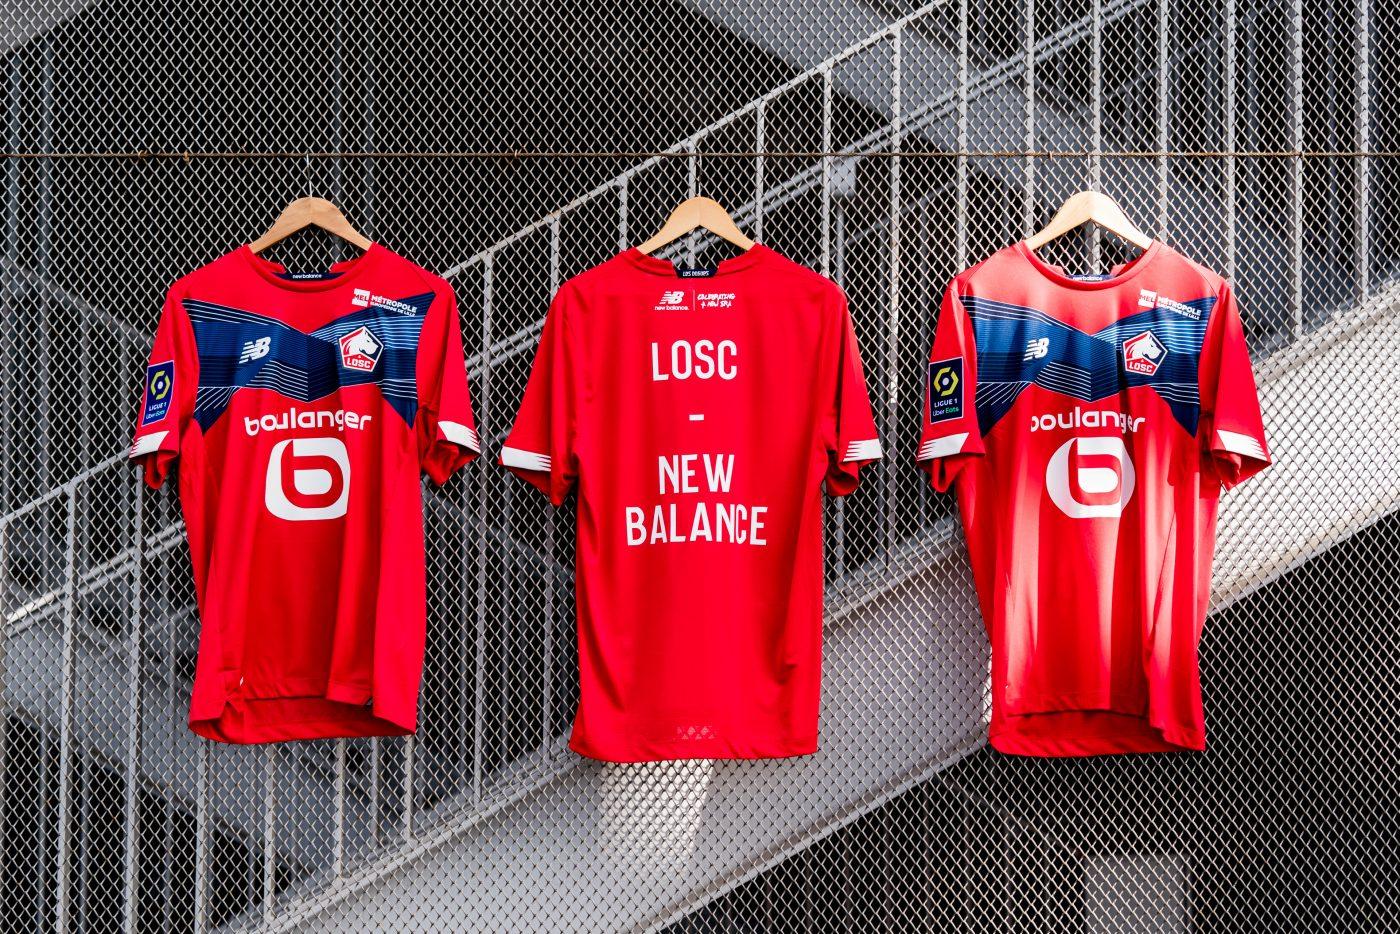 lille-osc-losc-prolongation-partenariat-new-balance-5